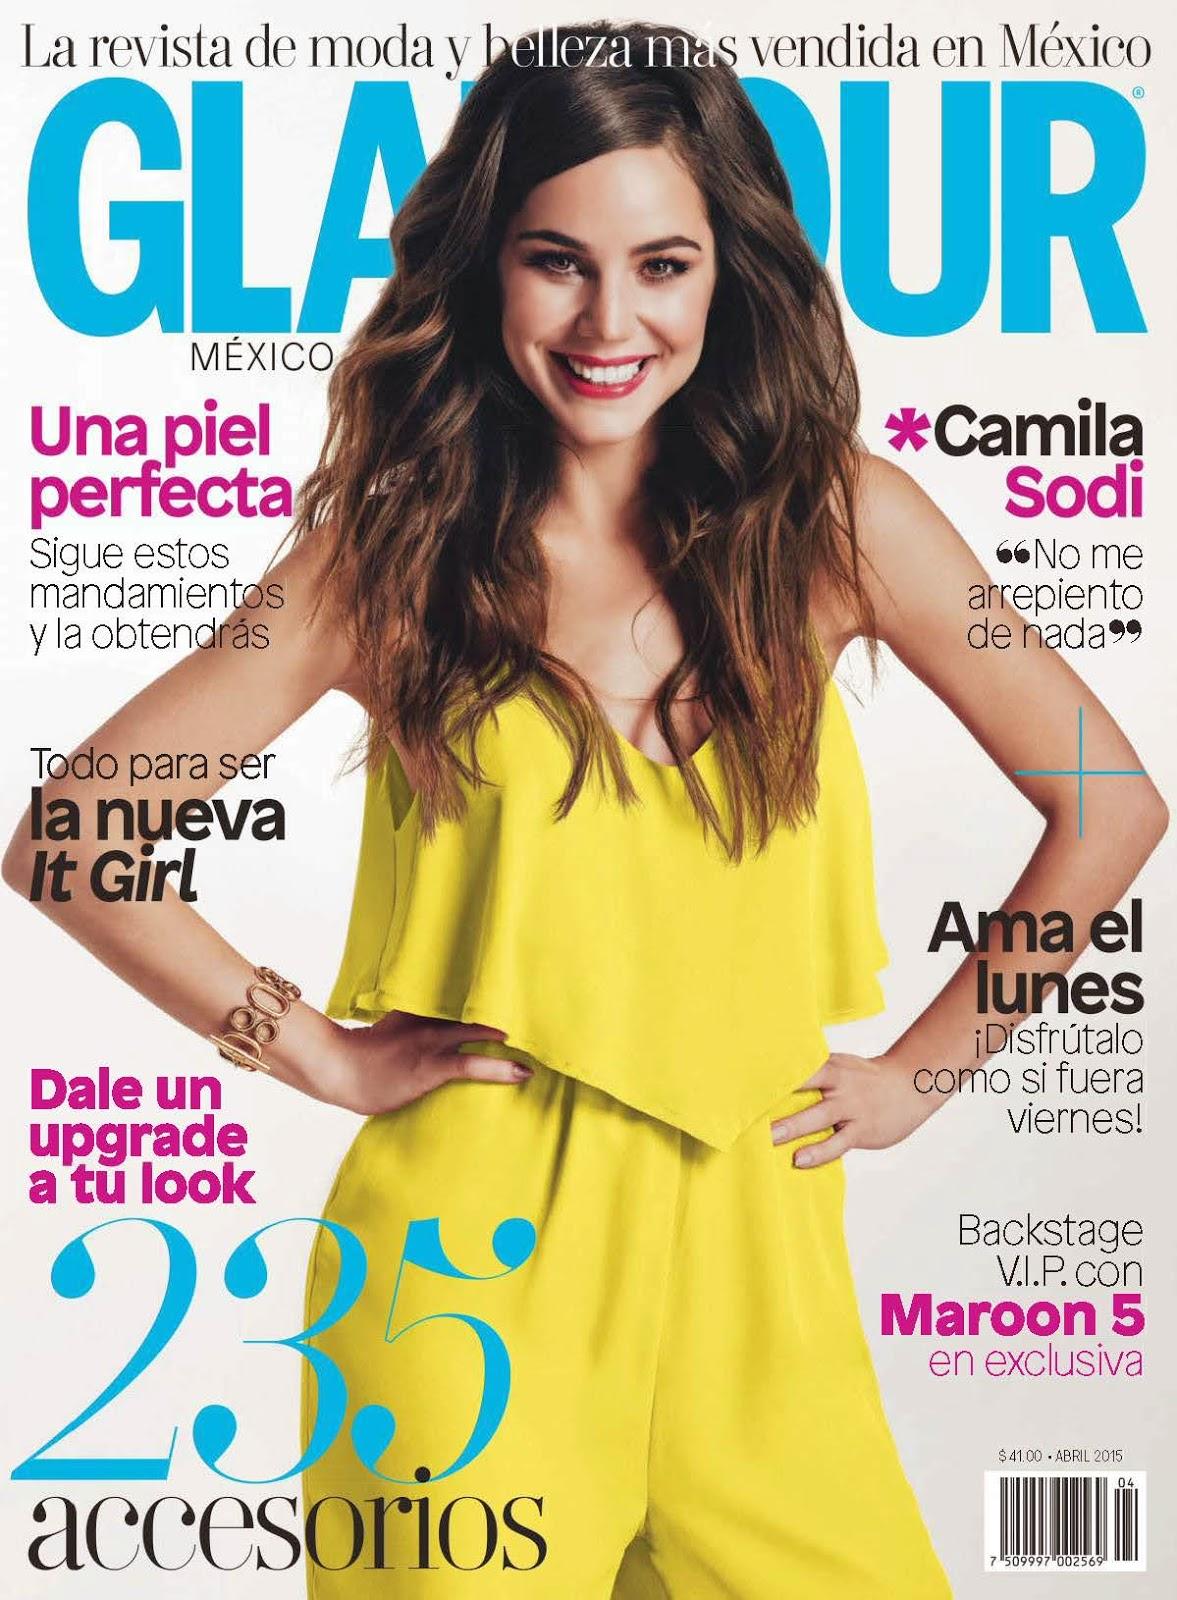 Singer, Actress, Model @ Camila Sodi by Dan Crosby for Glamour Mexico, April 2015